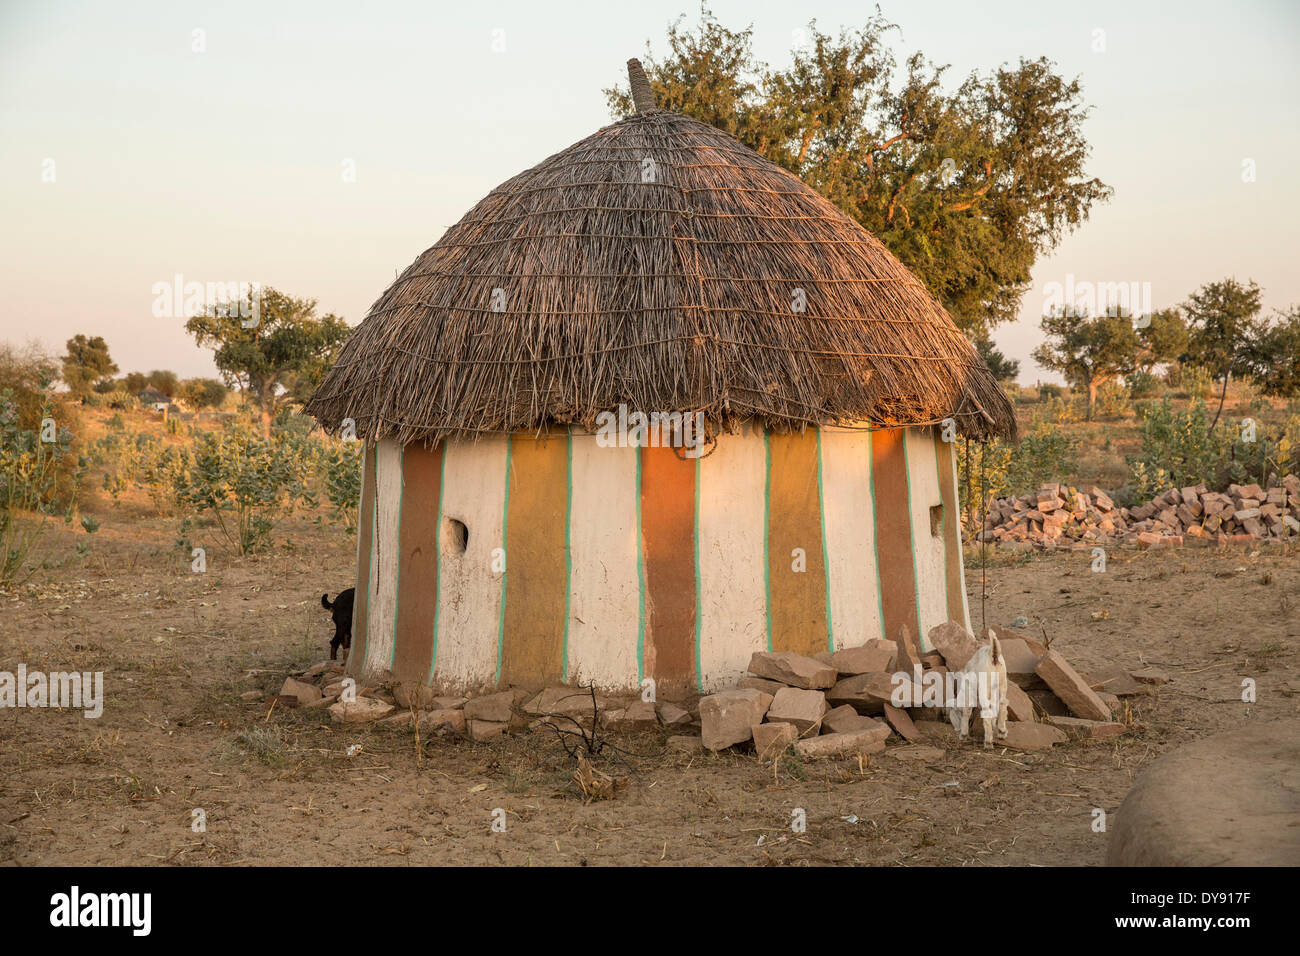 Rural, home, Setrawa, Ásia, Índia, Rajasthan, redondo, house Imagens de Stock